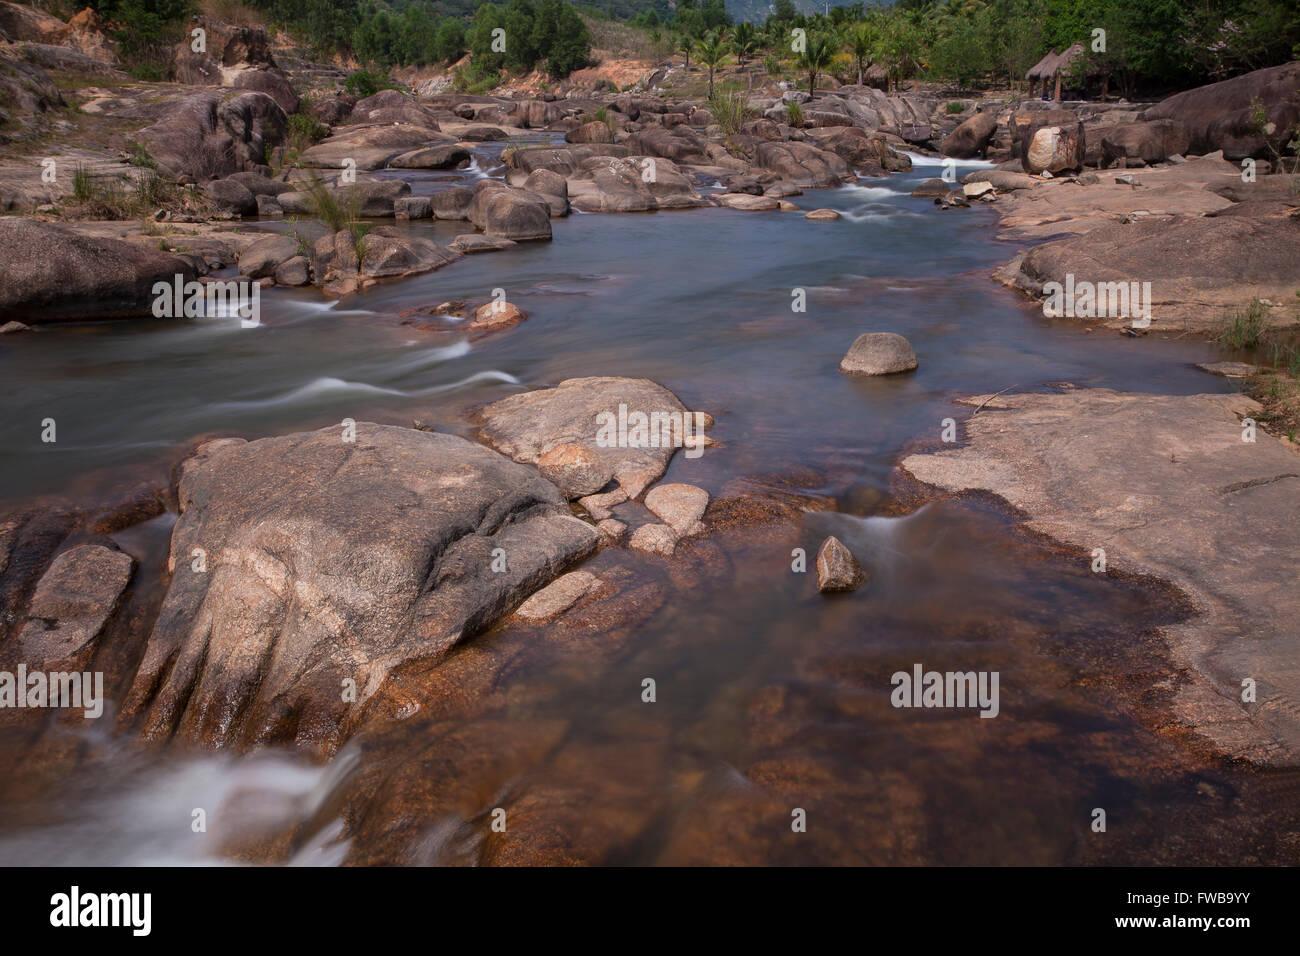 River at Yersin National Park, Ninh Thuan, Nha Trang, Vietnam - Stock Image